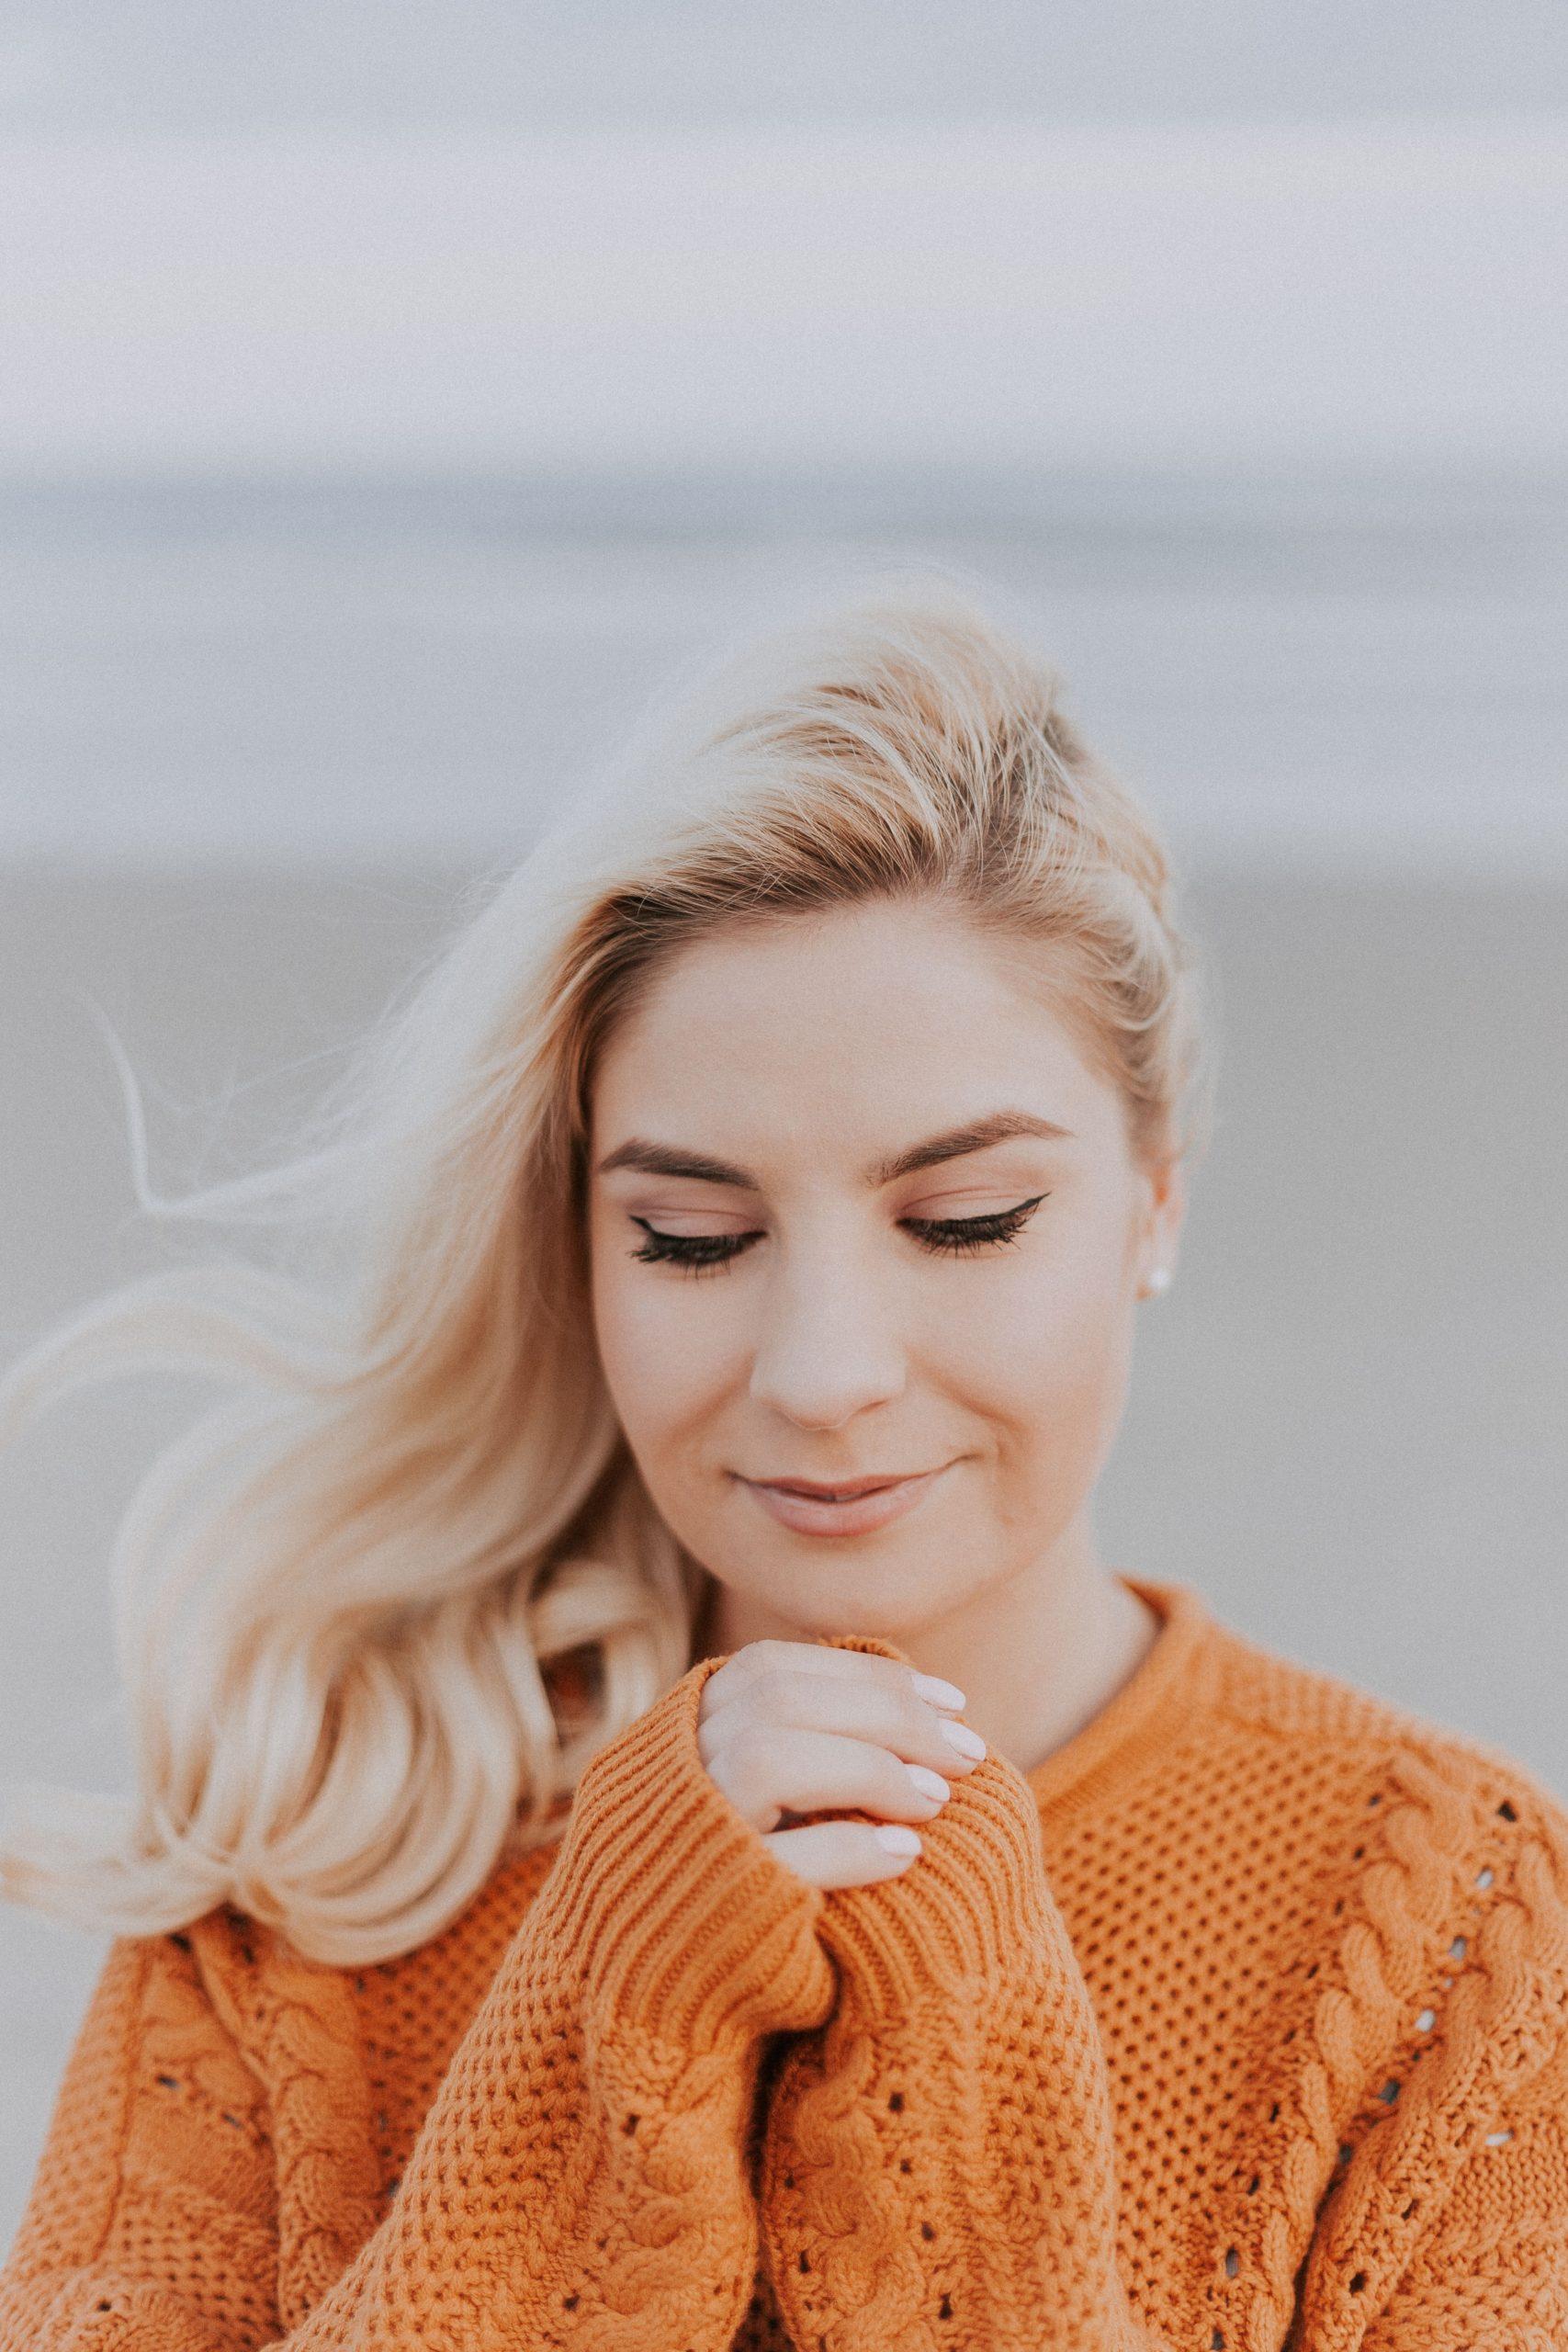 5 snelle manieren om uitgroei te verbergen